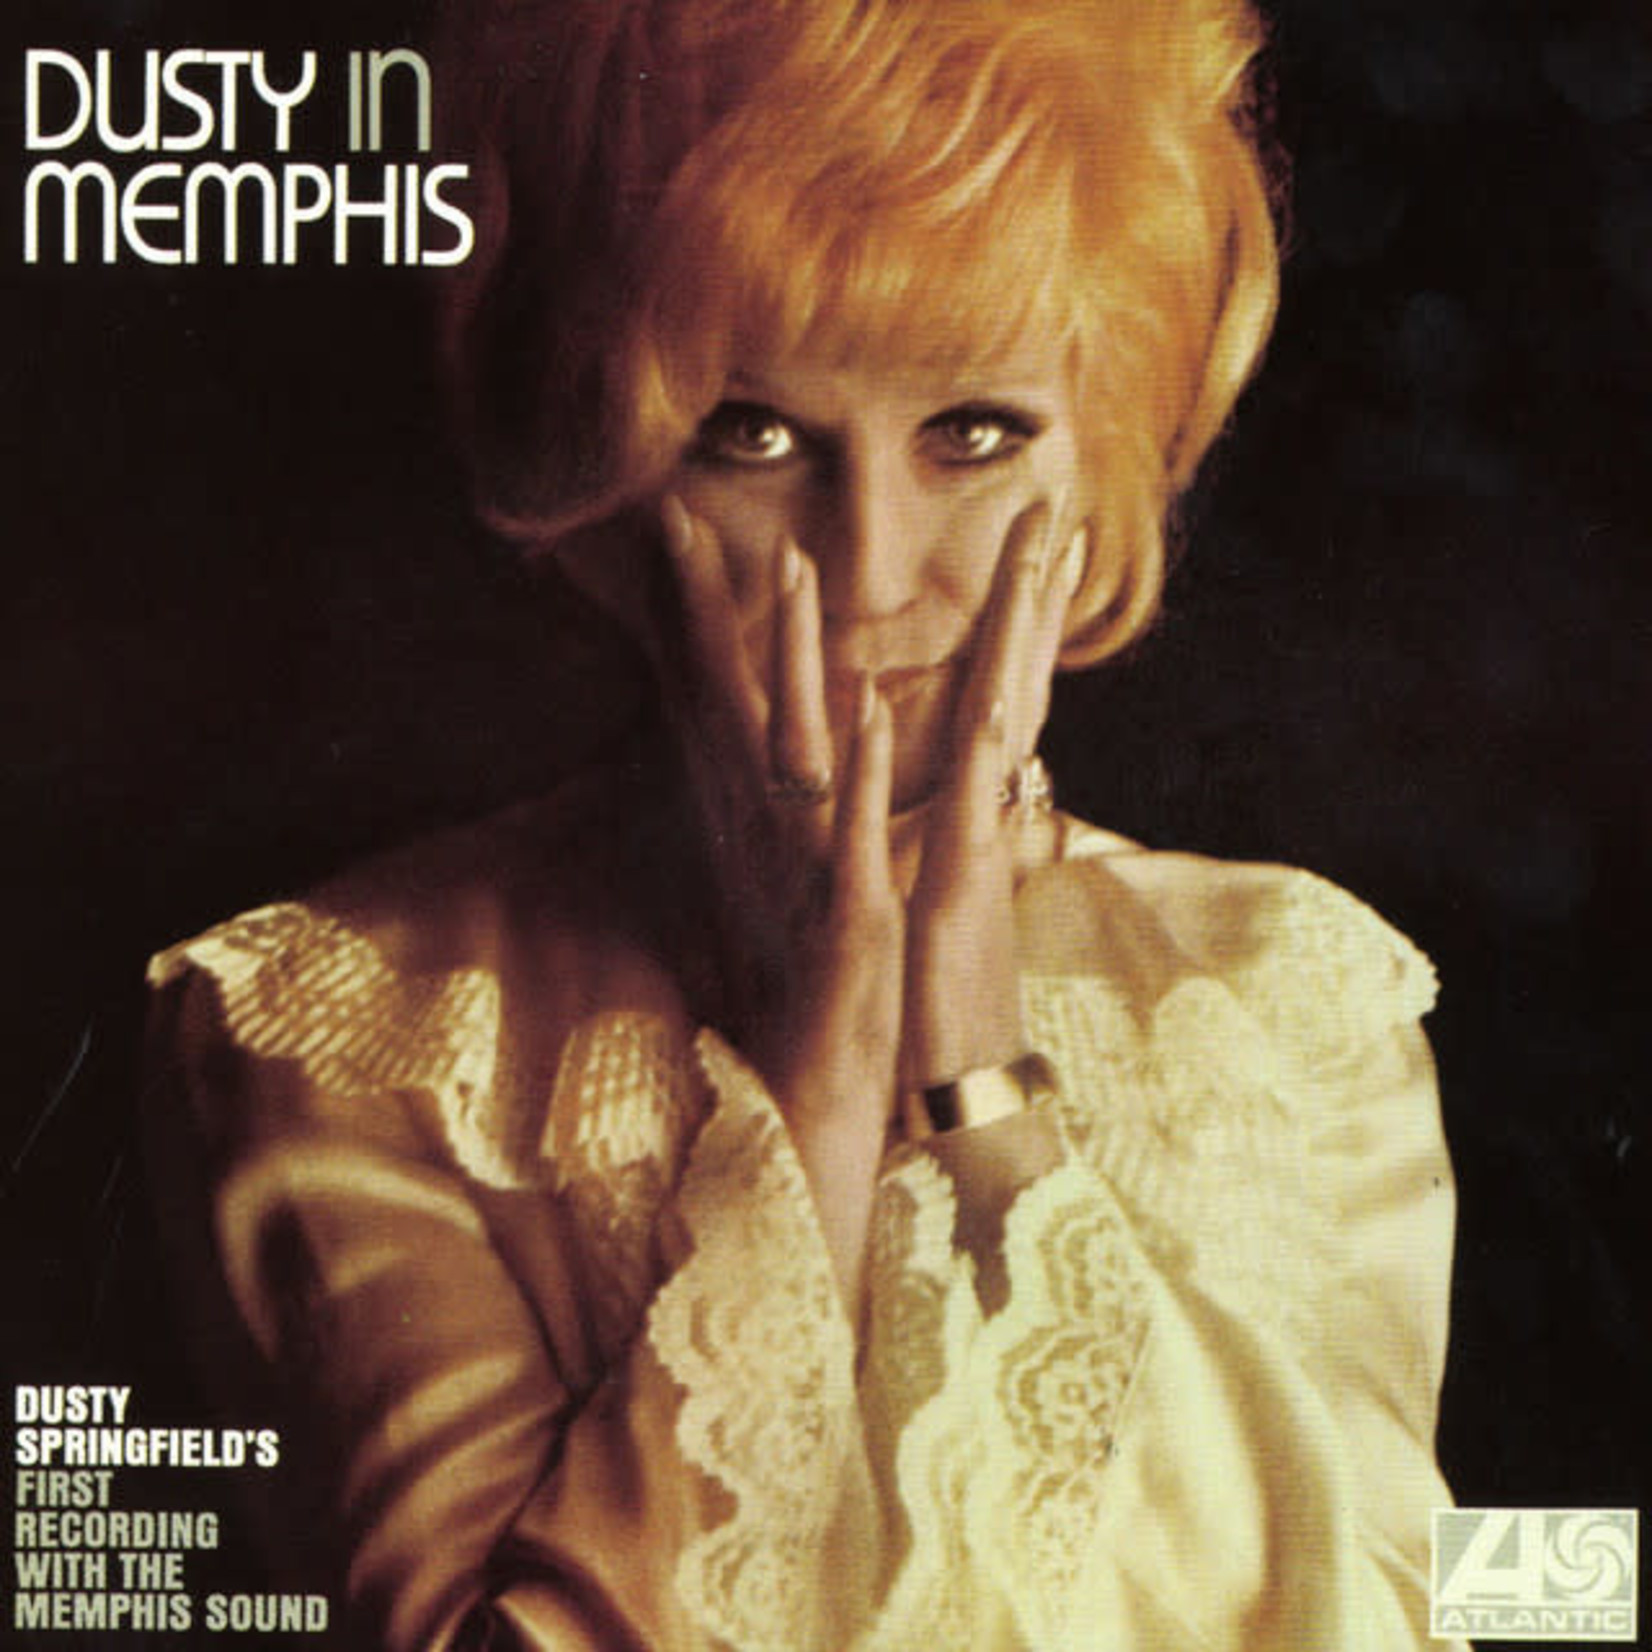 Vinyl Dusty Springfield - Dusty In Memphis (2LP) - Runout Groove